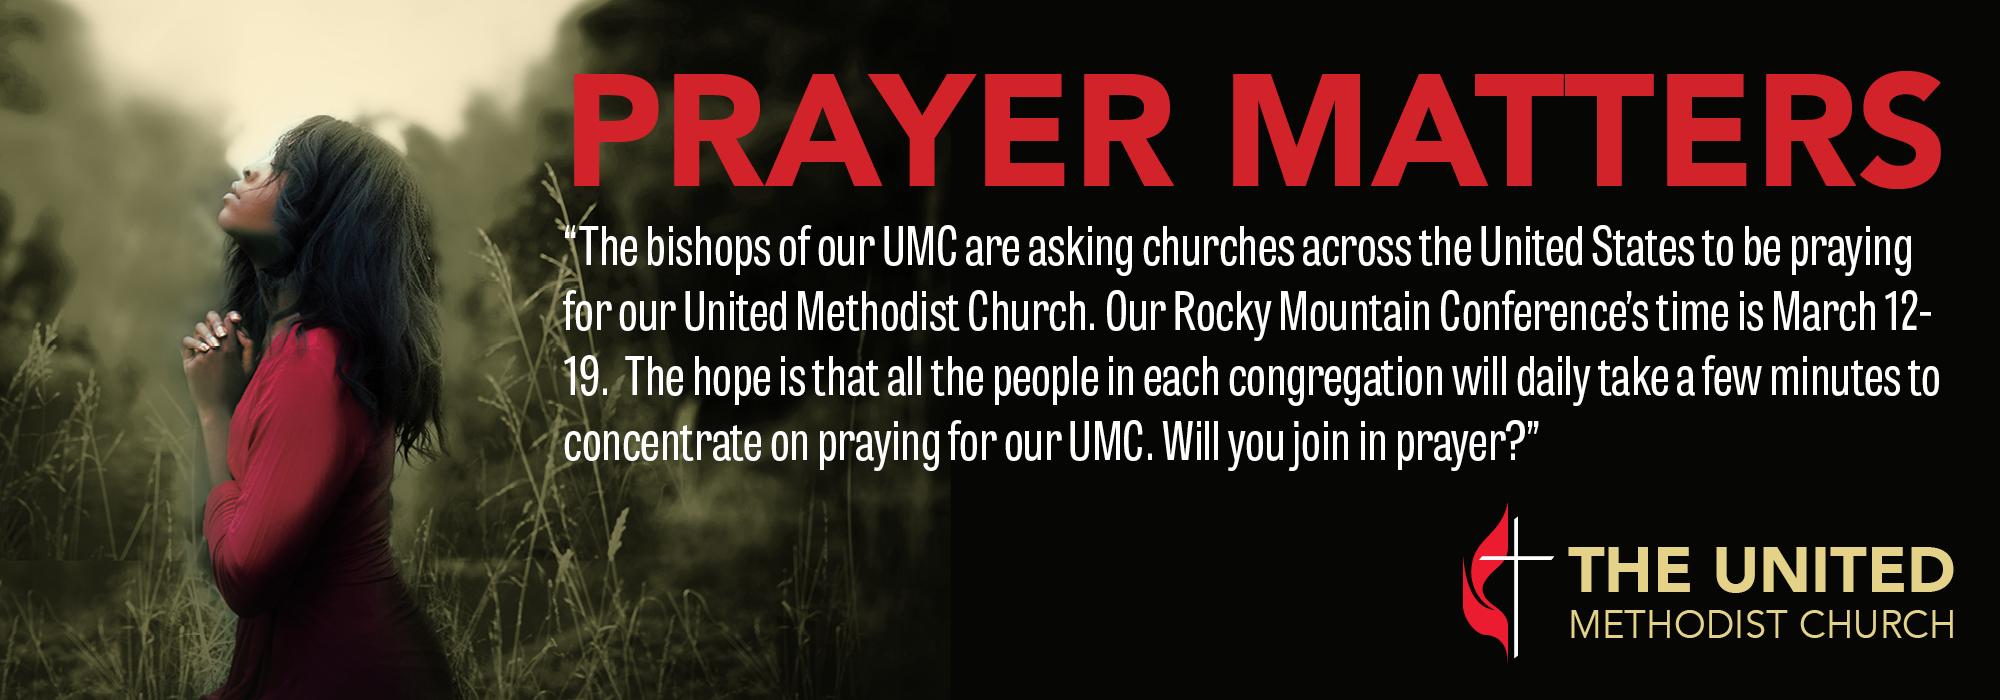 Prayer-Matters2